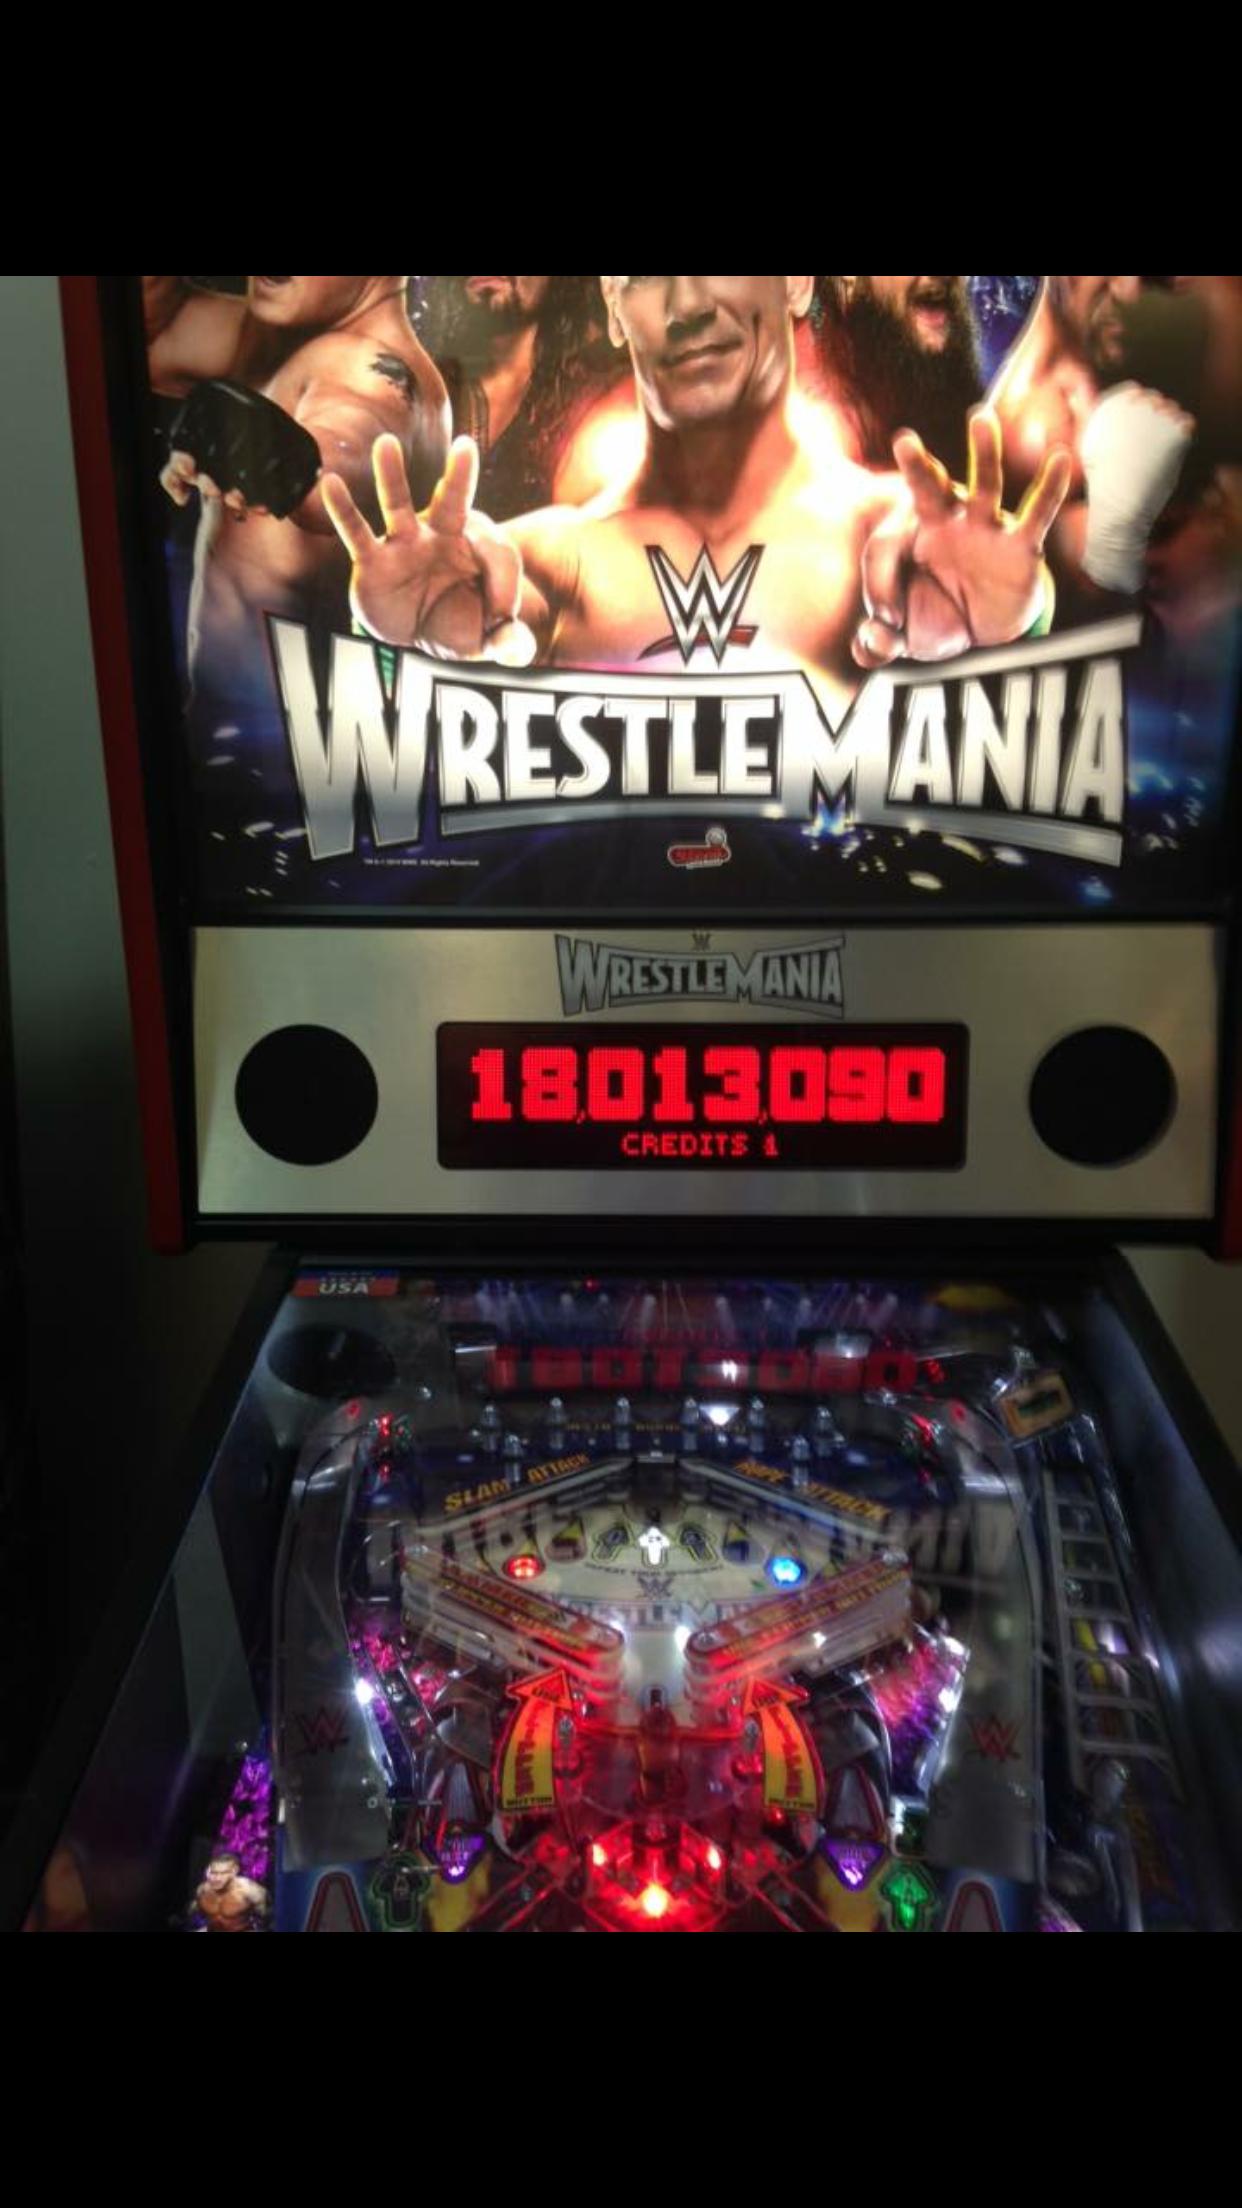 WWE Wrestlemania 18,013,090 points